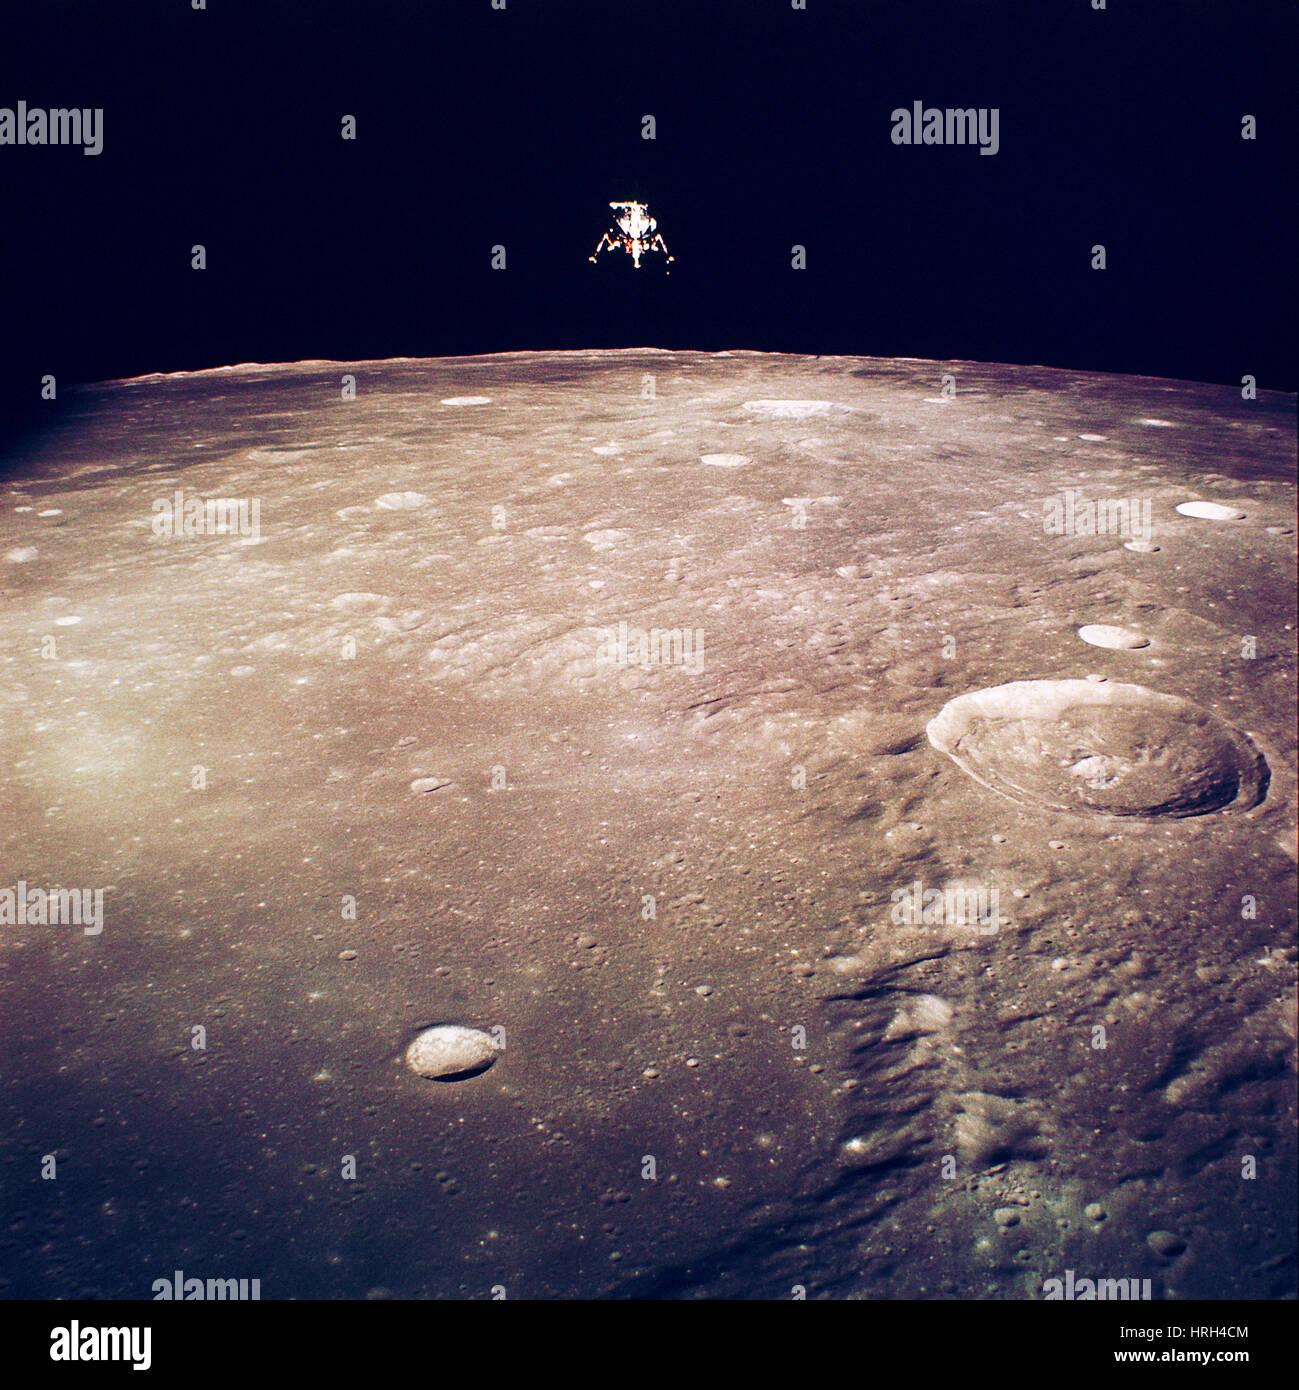 Apollo 12 Lunar Lander - Stock Image